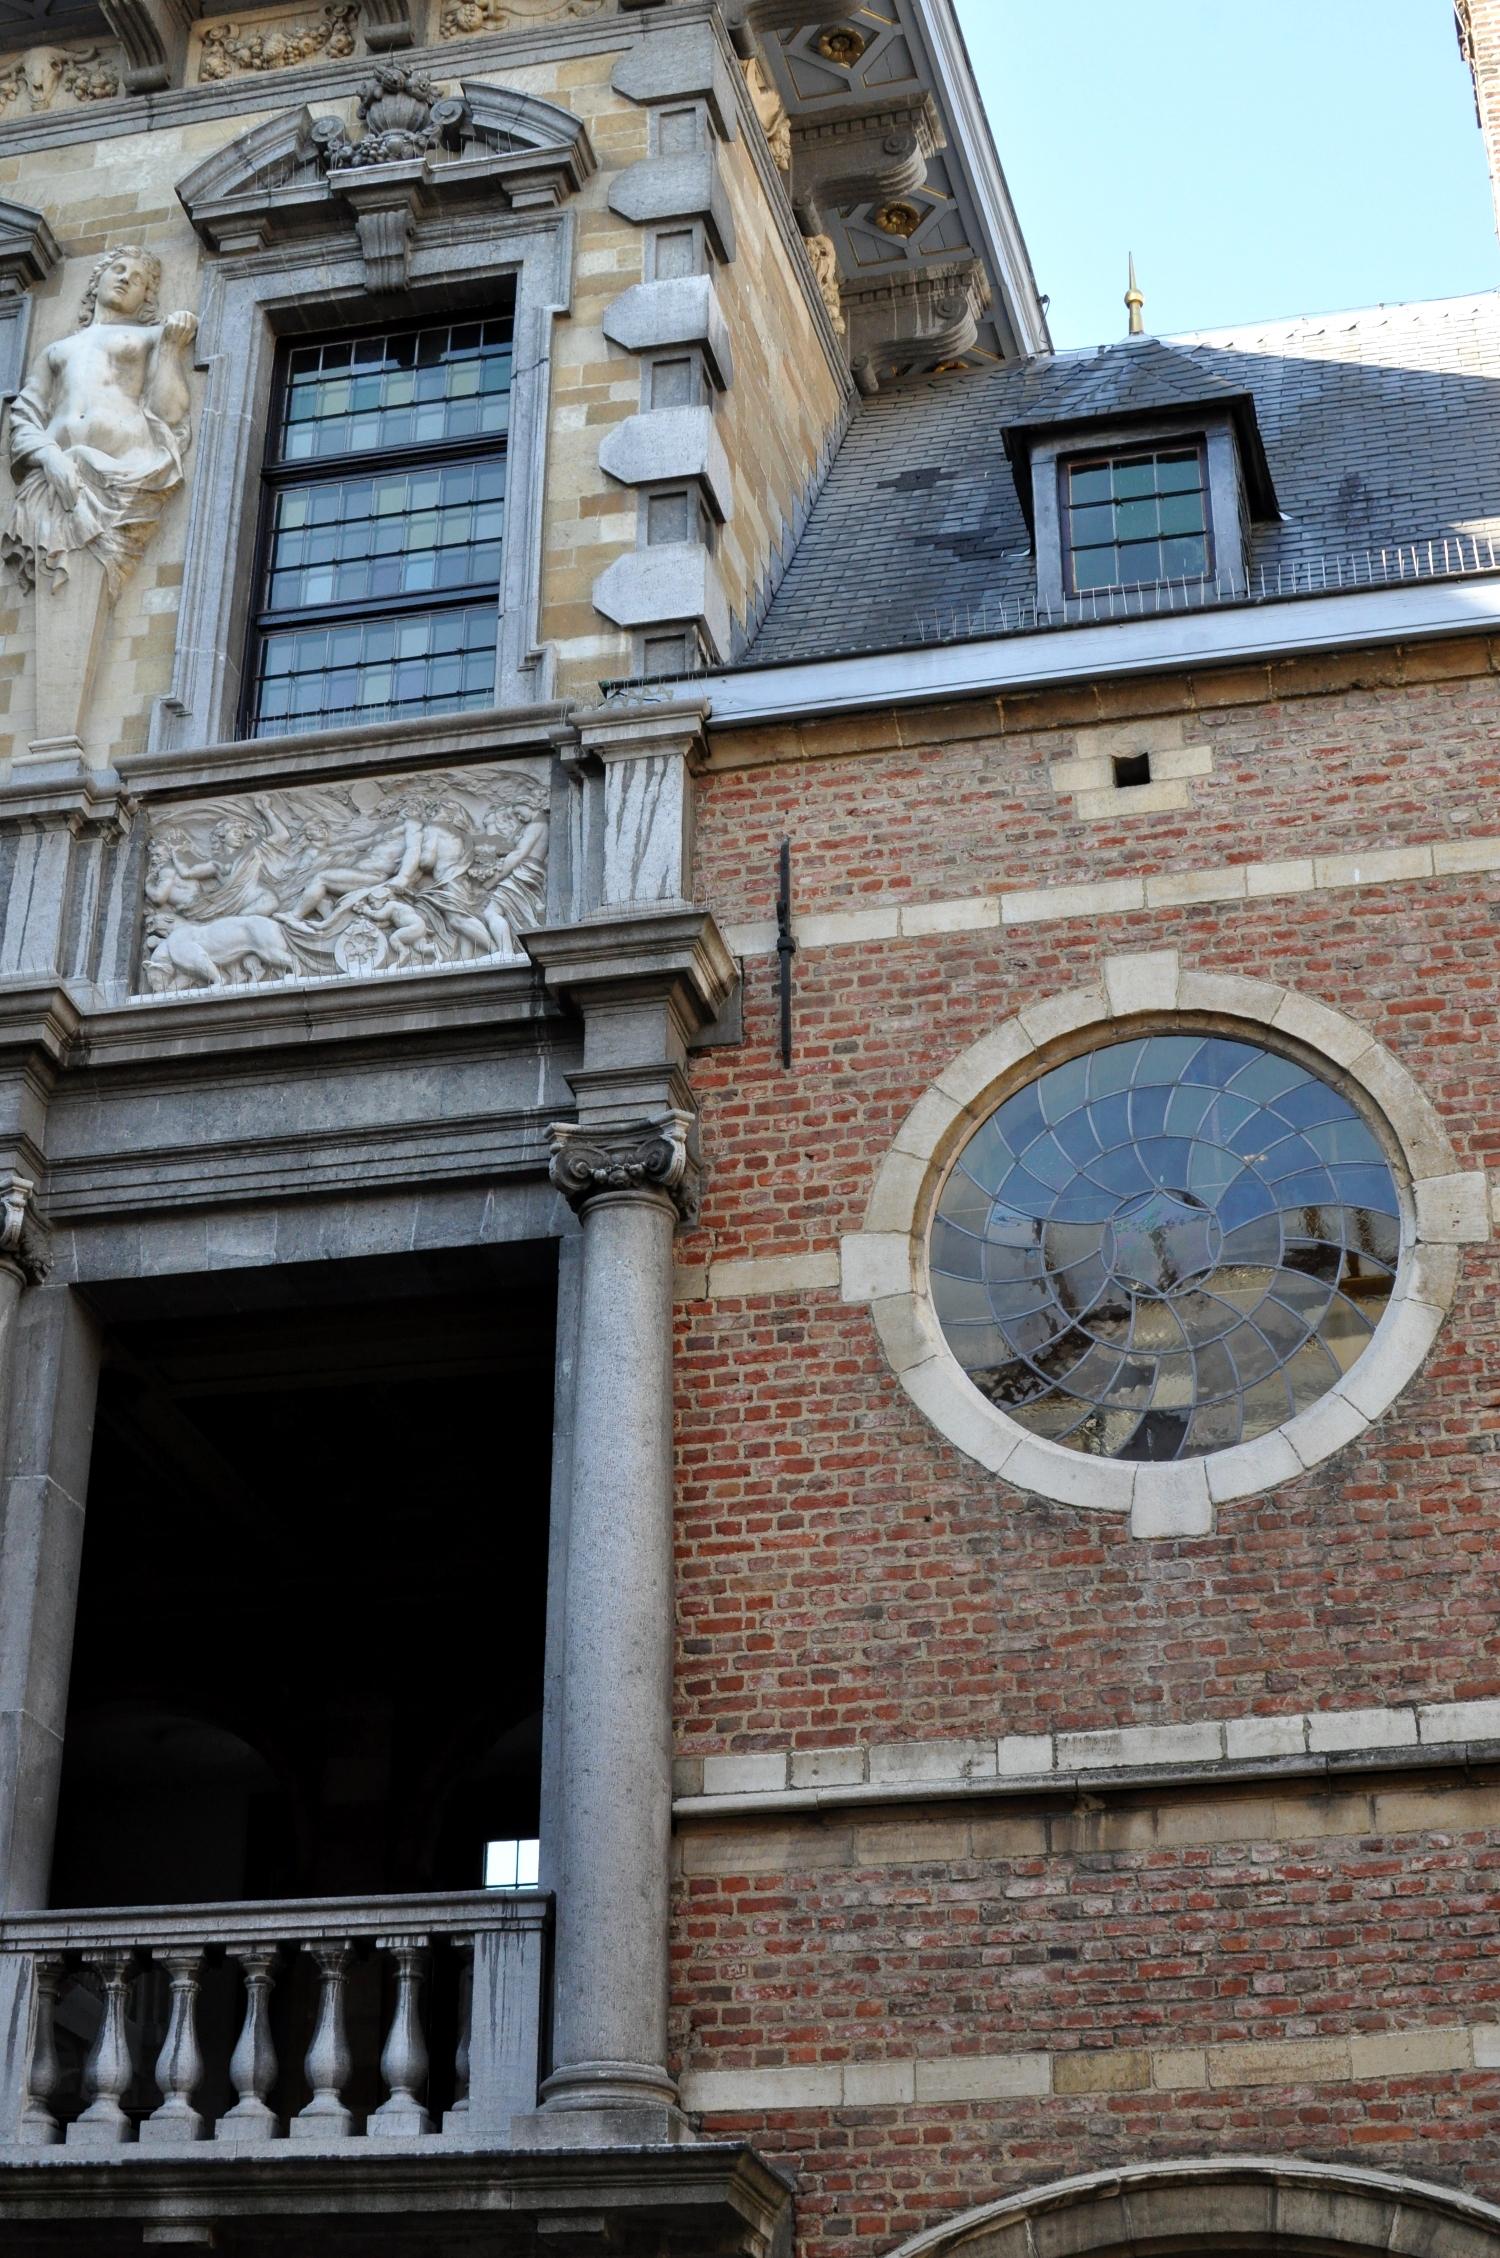 rocaille-blog-rubens-house-rubenhuis-anversa-antwerpen-fiandre-flanders-28